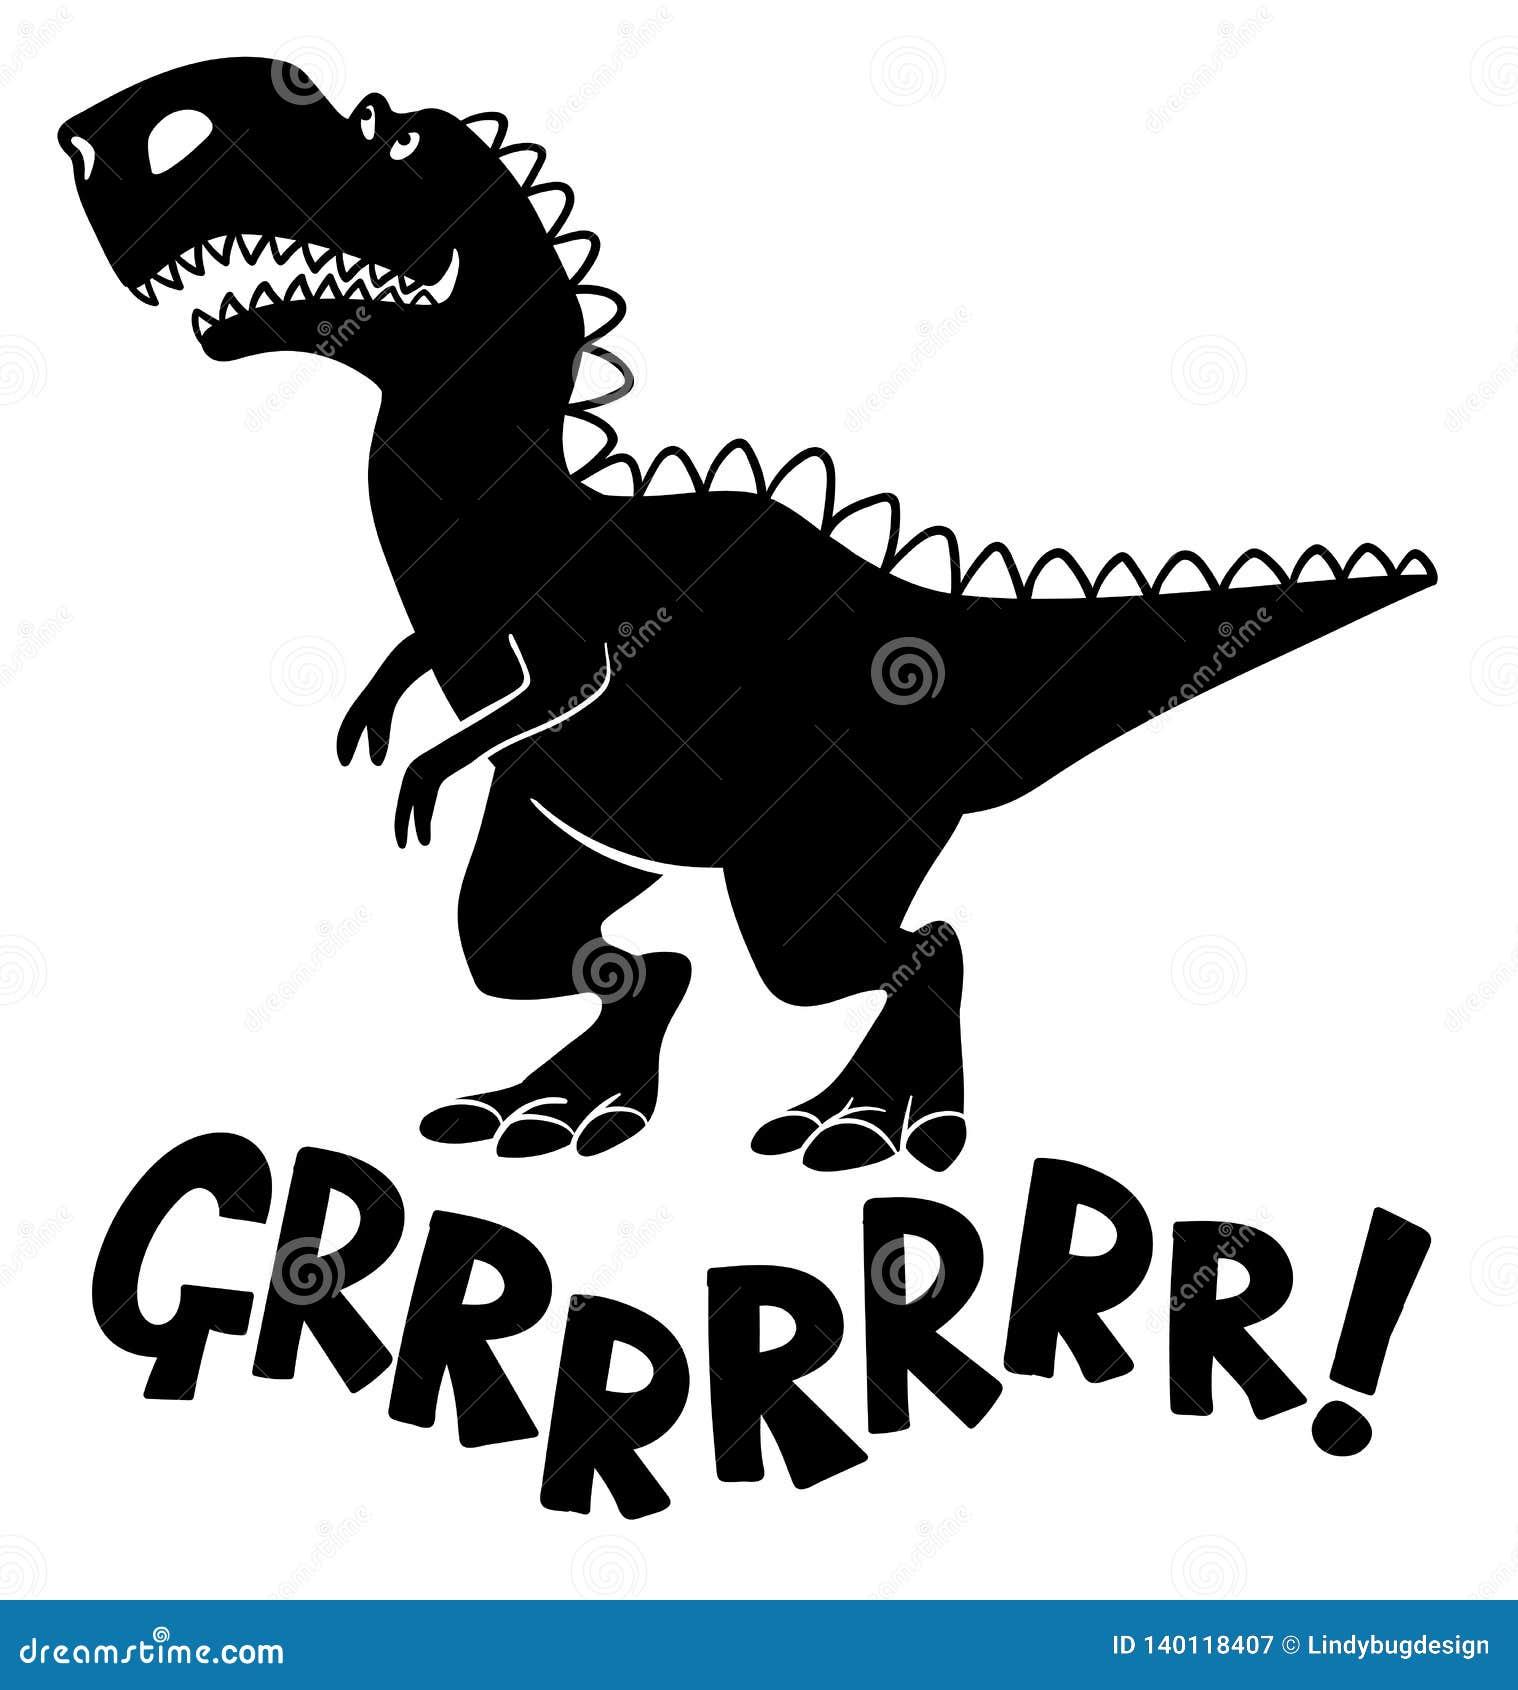 Silueta negra de un tipo dinosaurio del t-rex